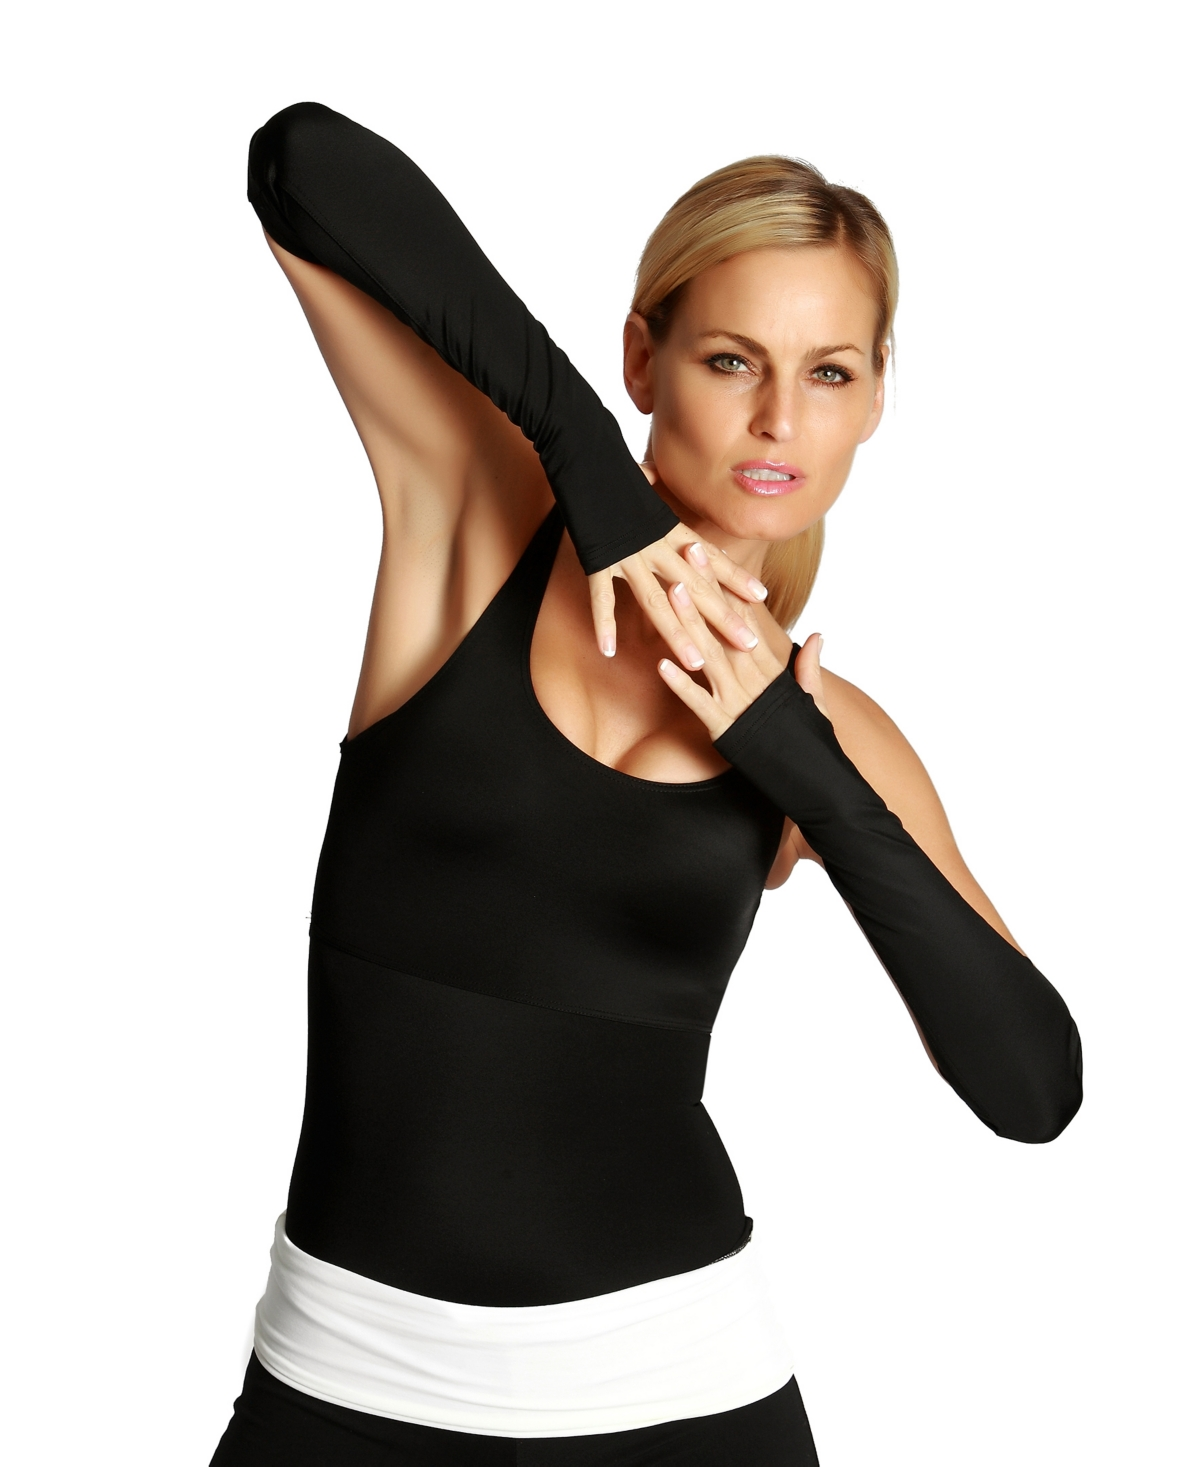 InstantFigure Powerful Compression Long Wrist Guards